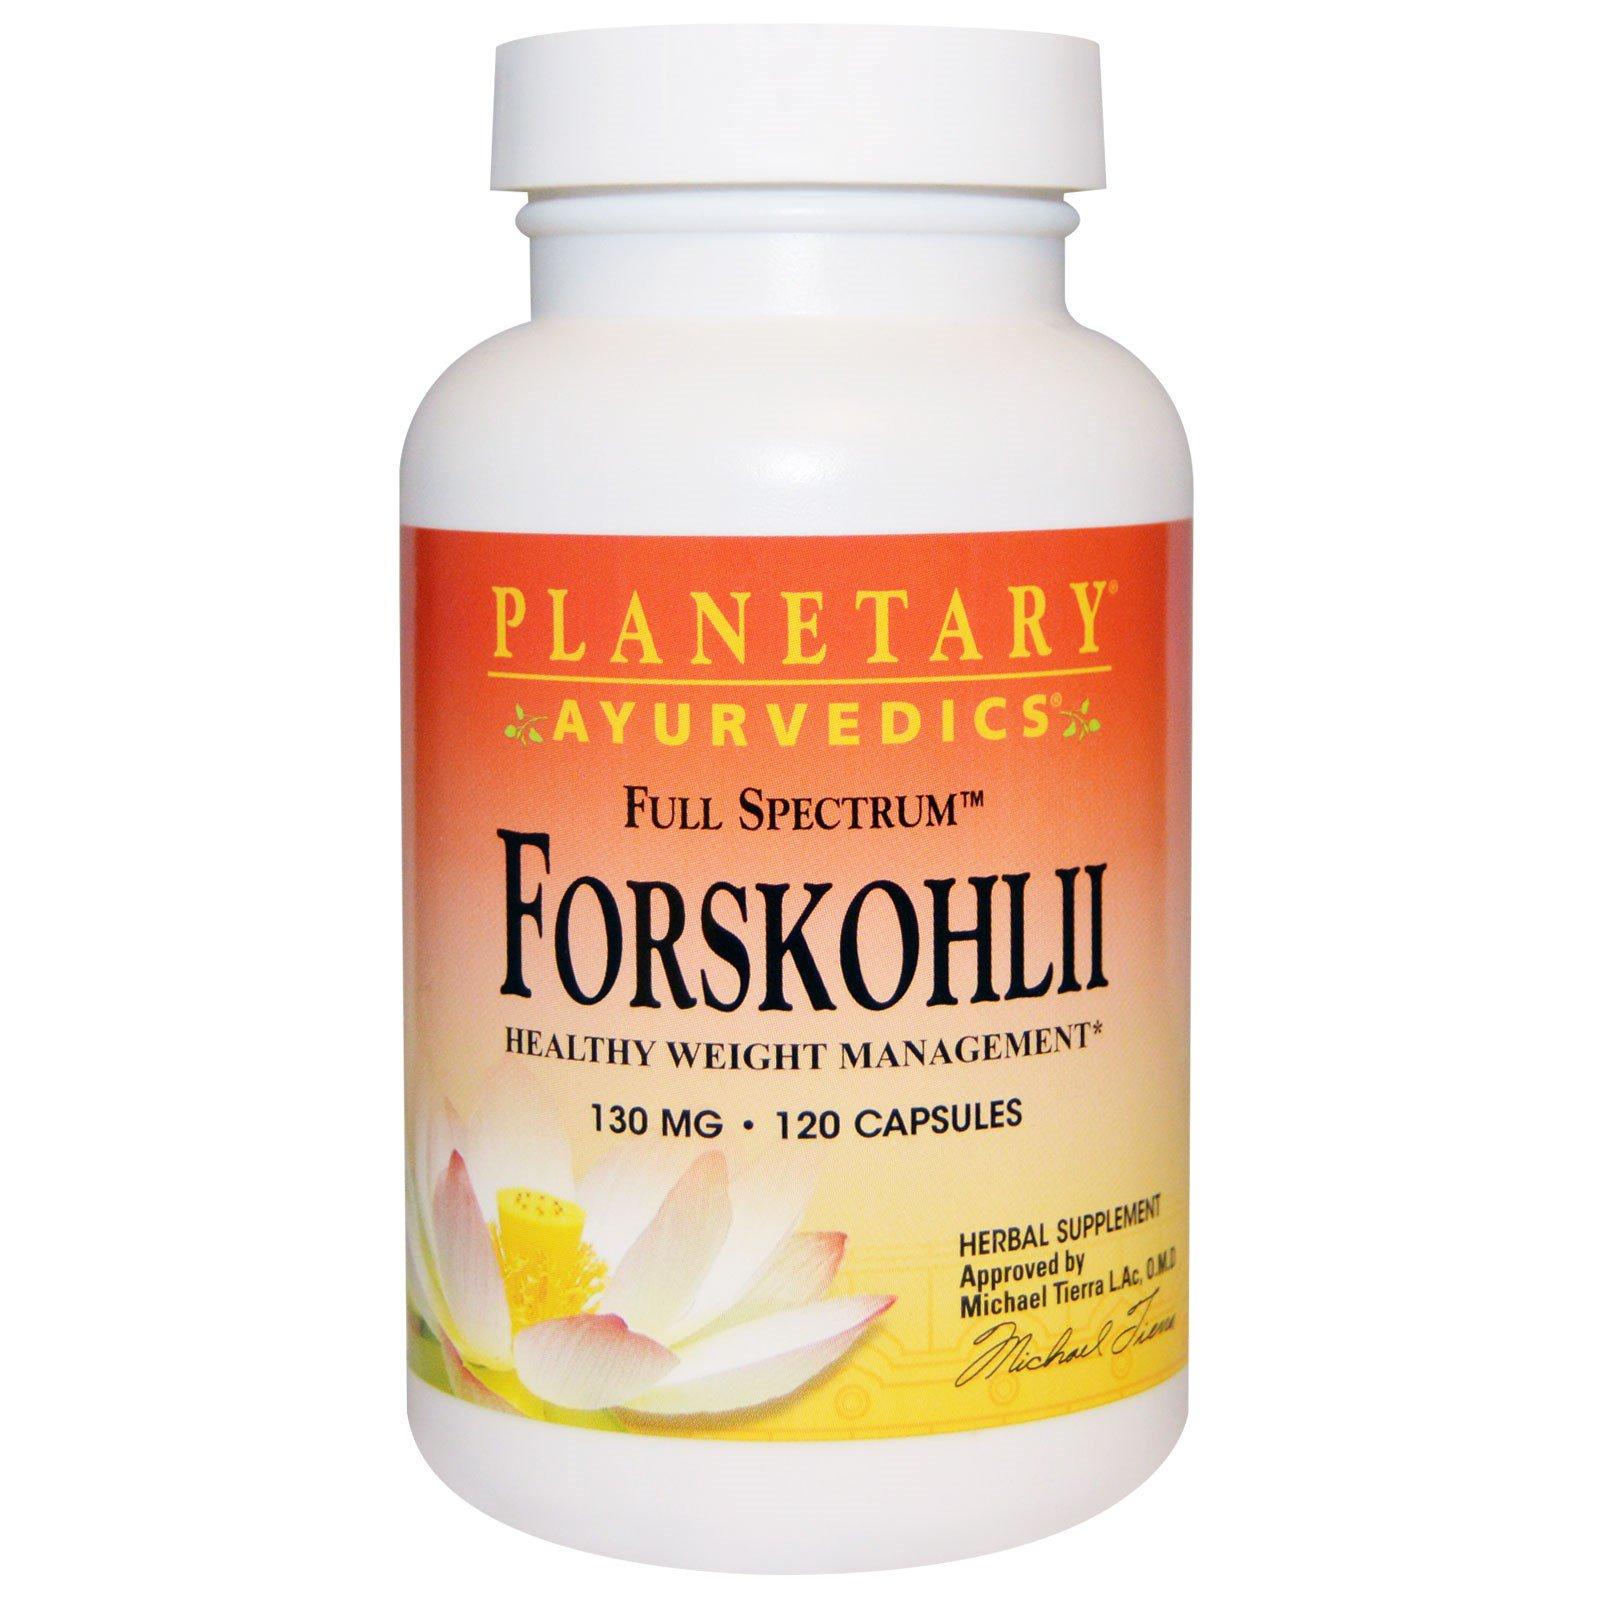 Planetary Herbals, Ayurvedics, полный спектр, колеус форсколии, 130 мг, 120 капсул